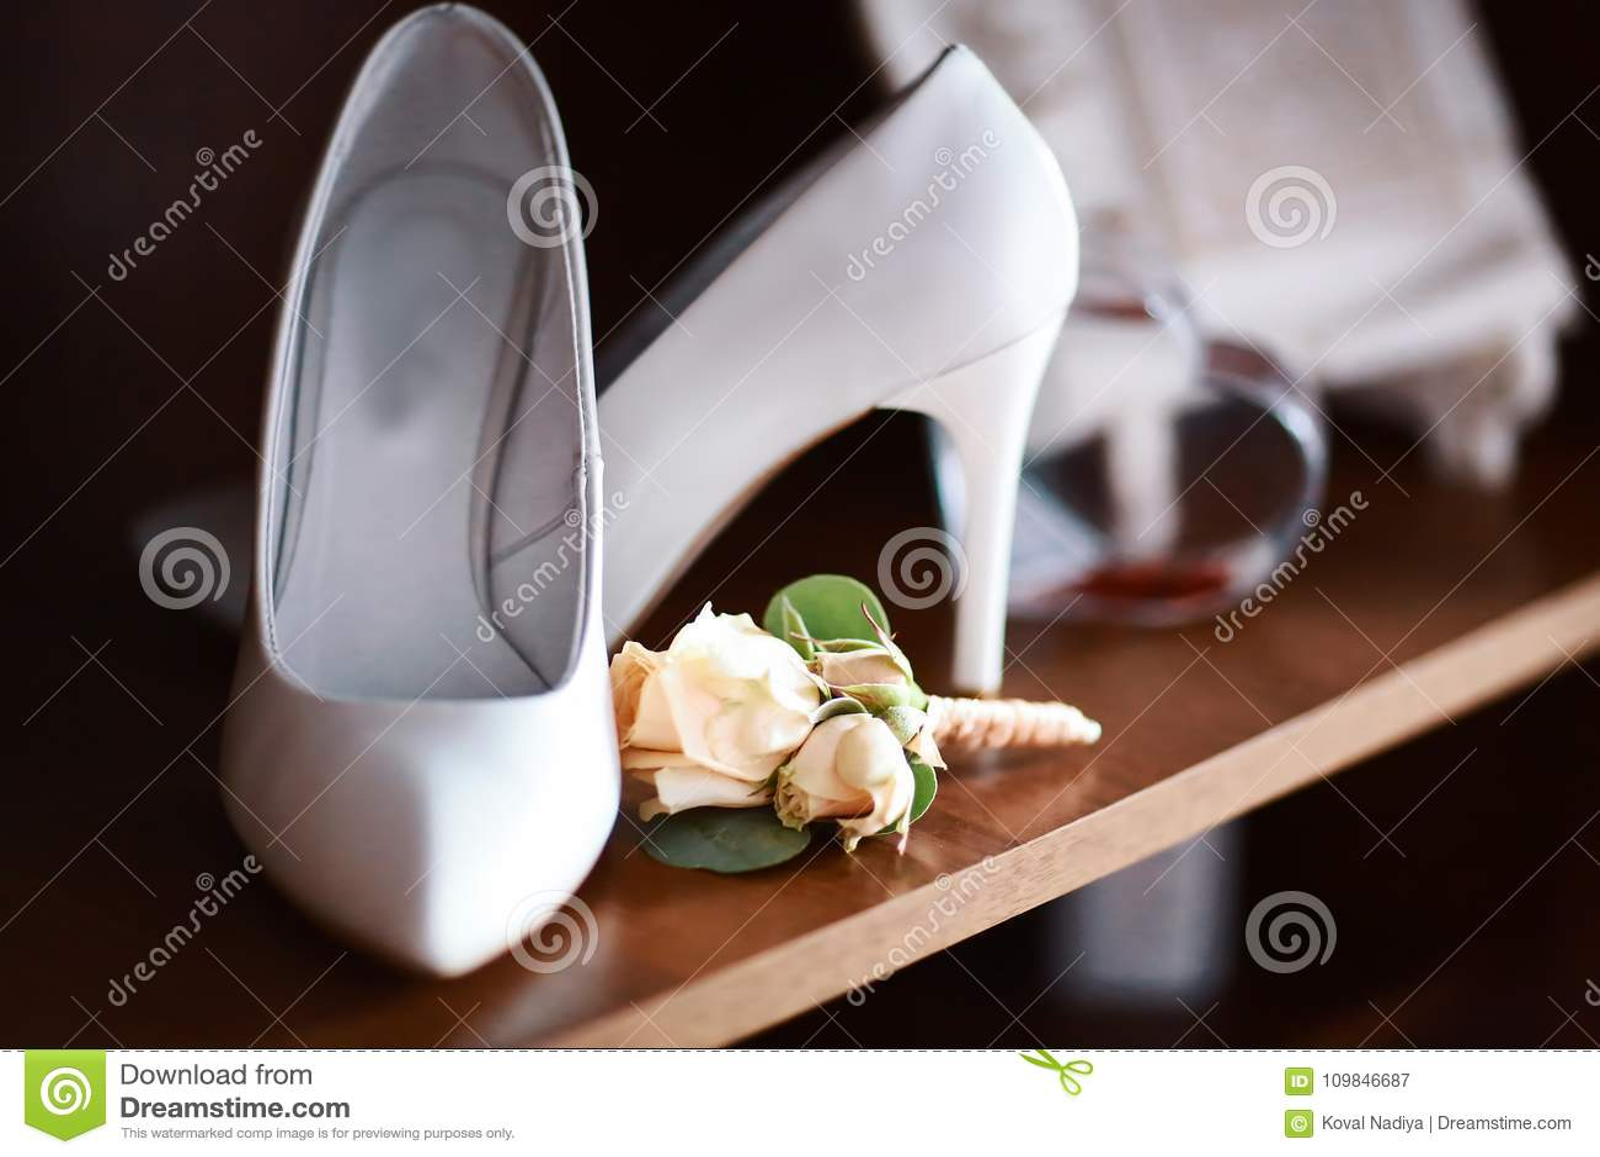 Wedding accessories bouquet beige flowers for groom and white shoes download wedding accessories bouquet beige flowers for groom and white shoes on heels dark wooden mightylinksfo